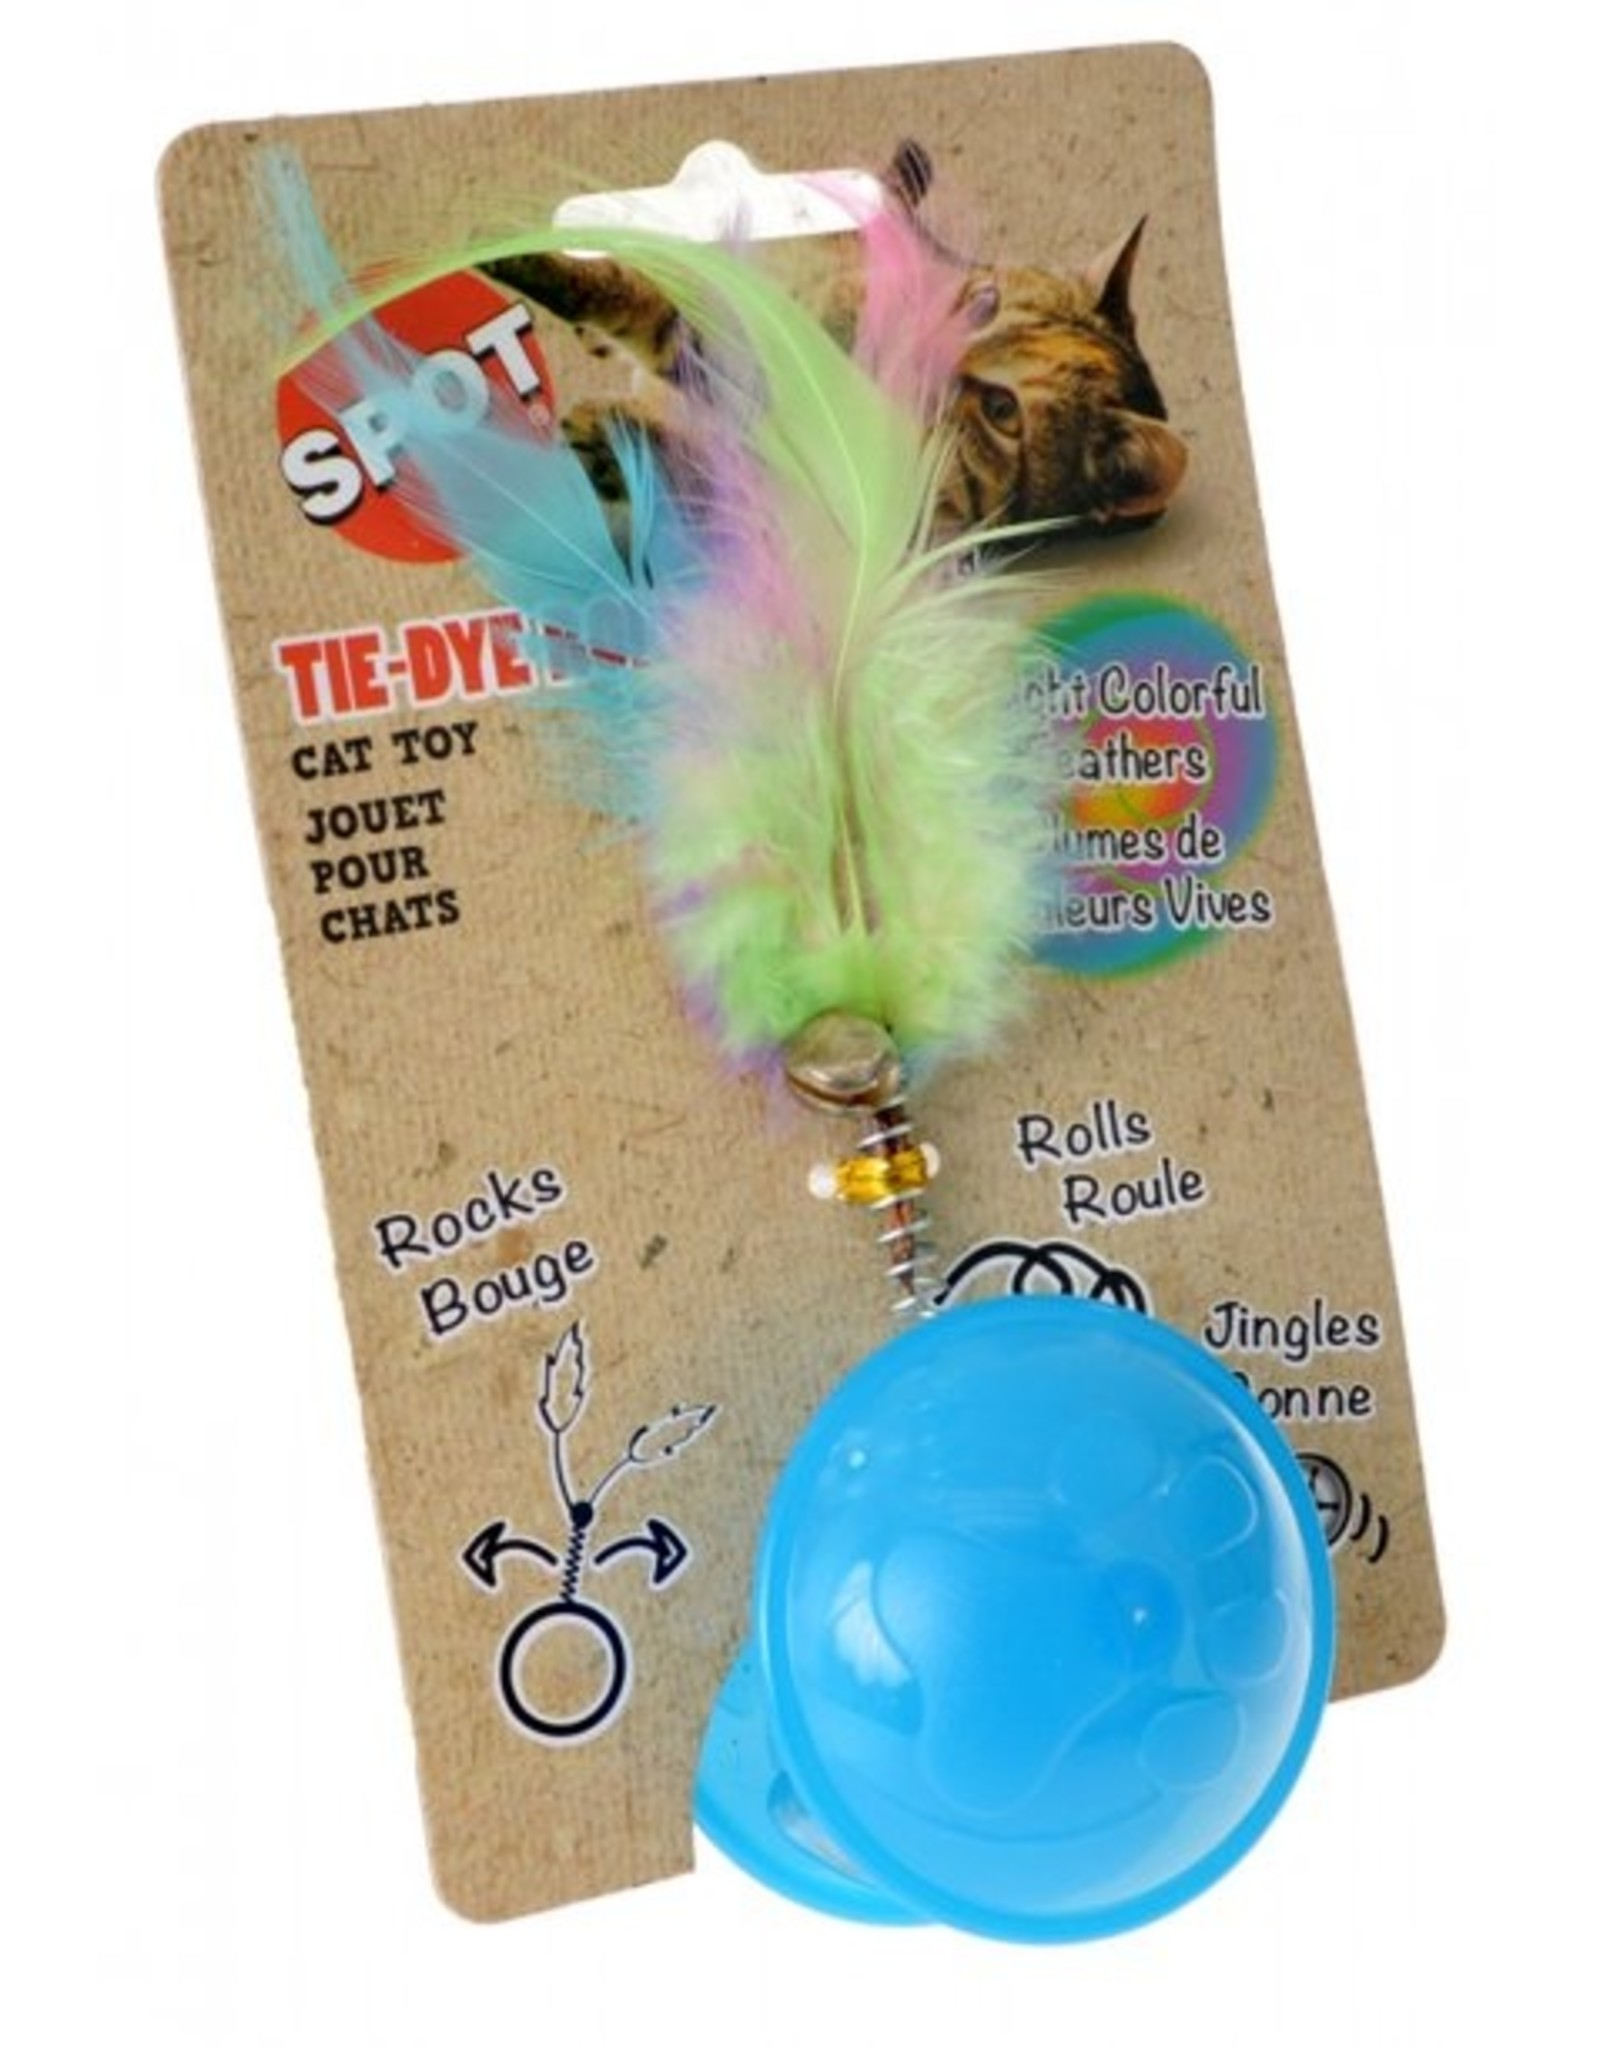 Tie Dye Roller Ball Catnip Toy Assorted 1ea/6 in